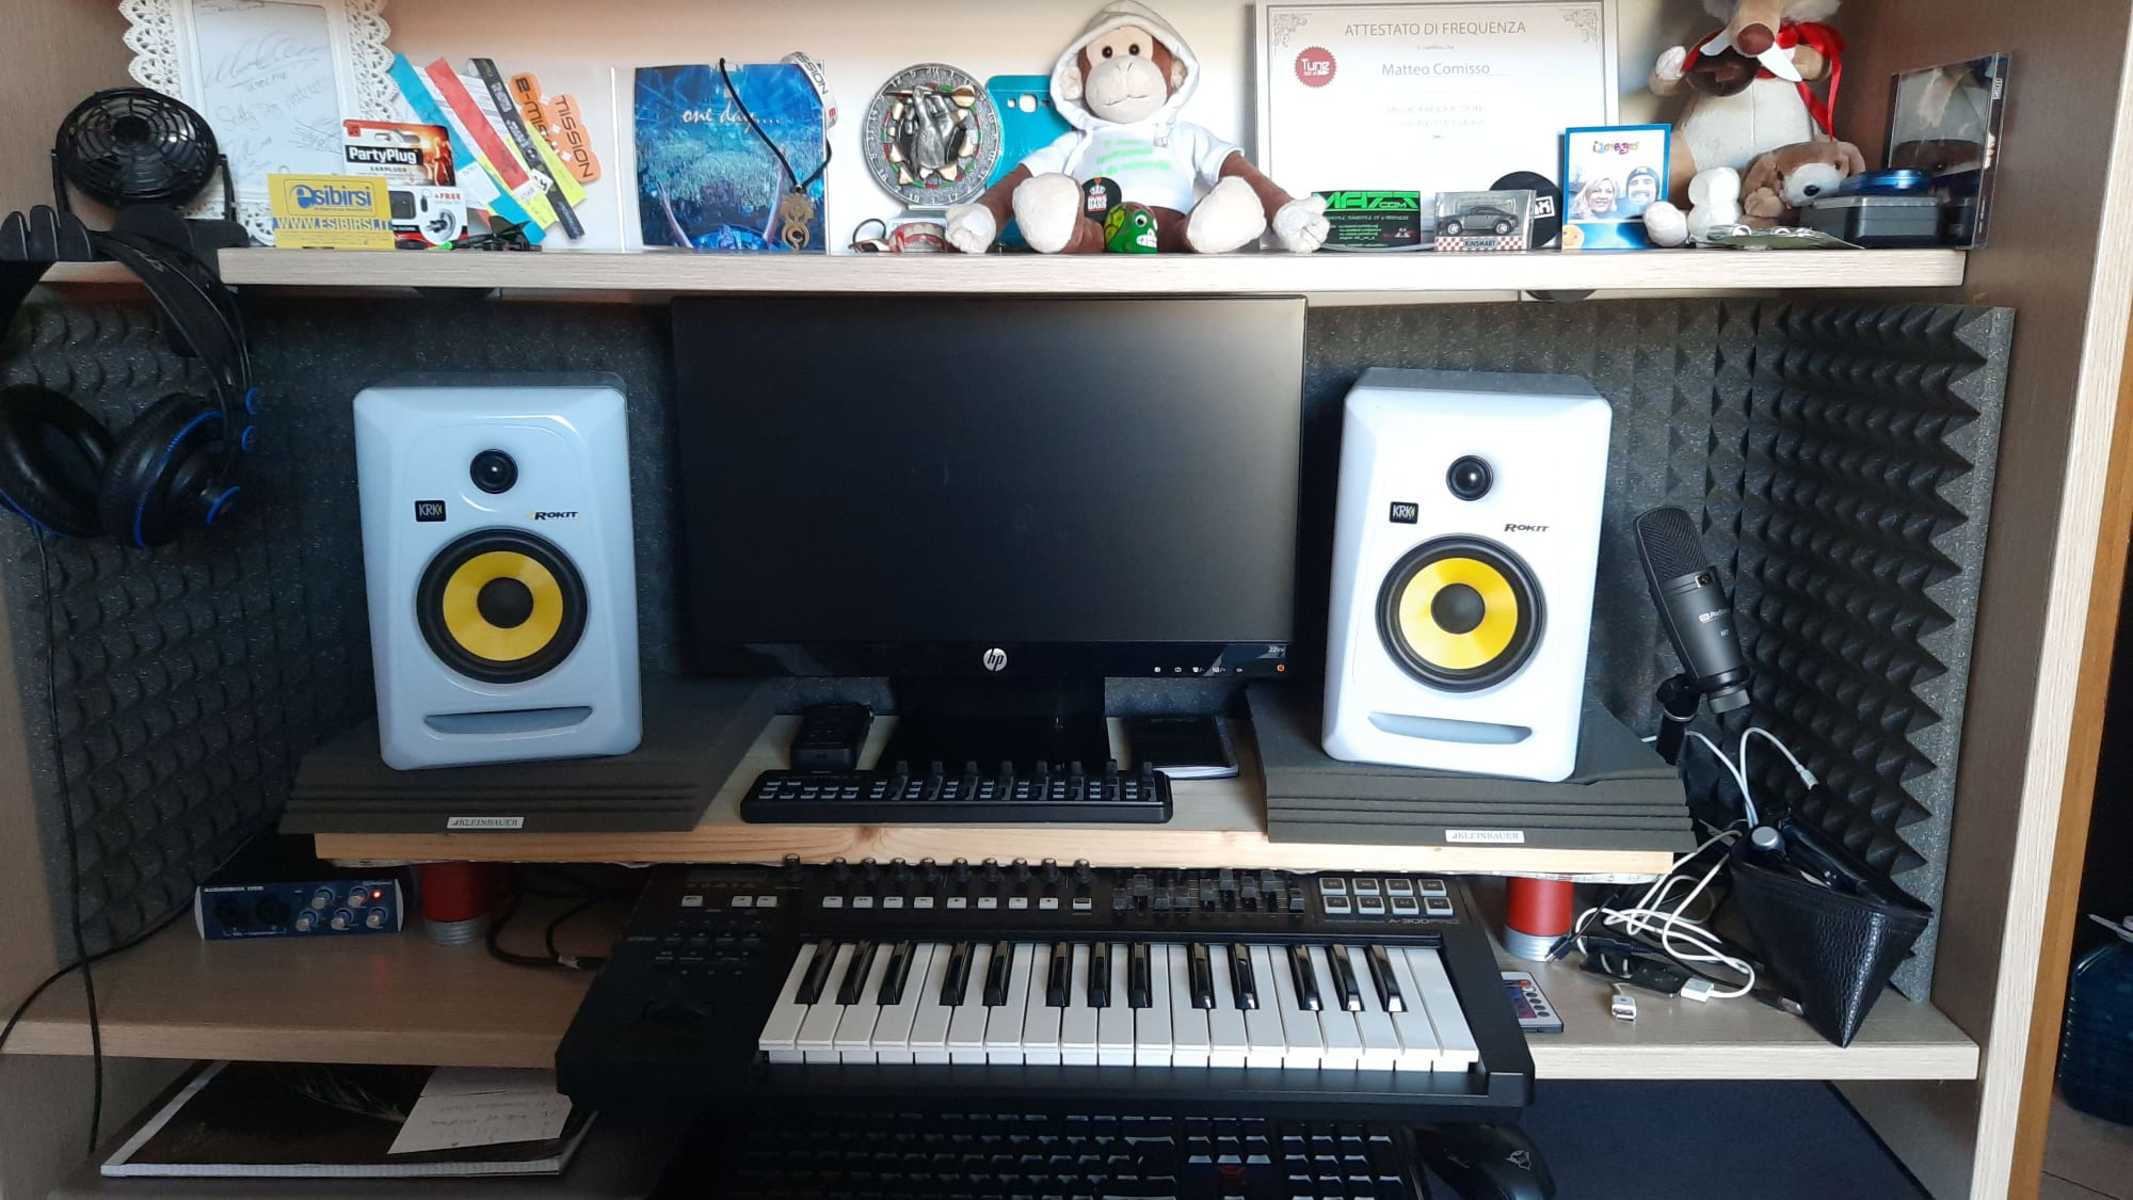 Photo of PreSonus AudioBox USB 2x2 Audio Recording Interface and more gear